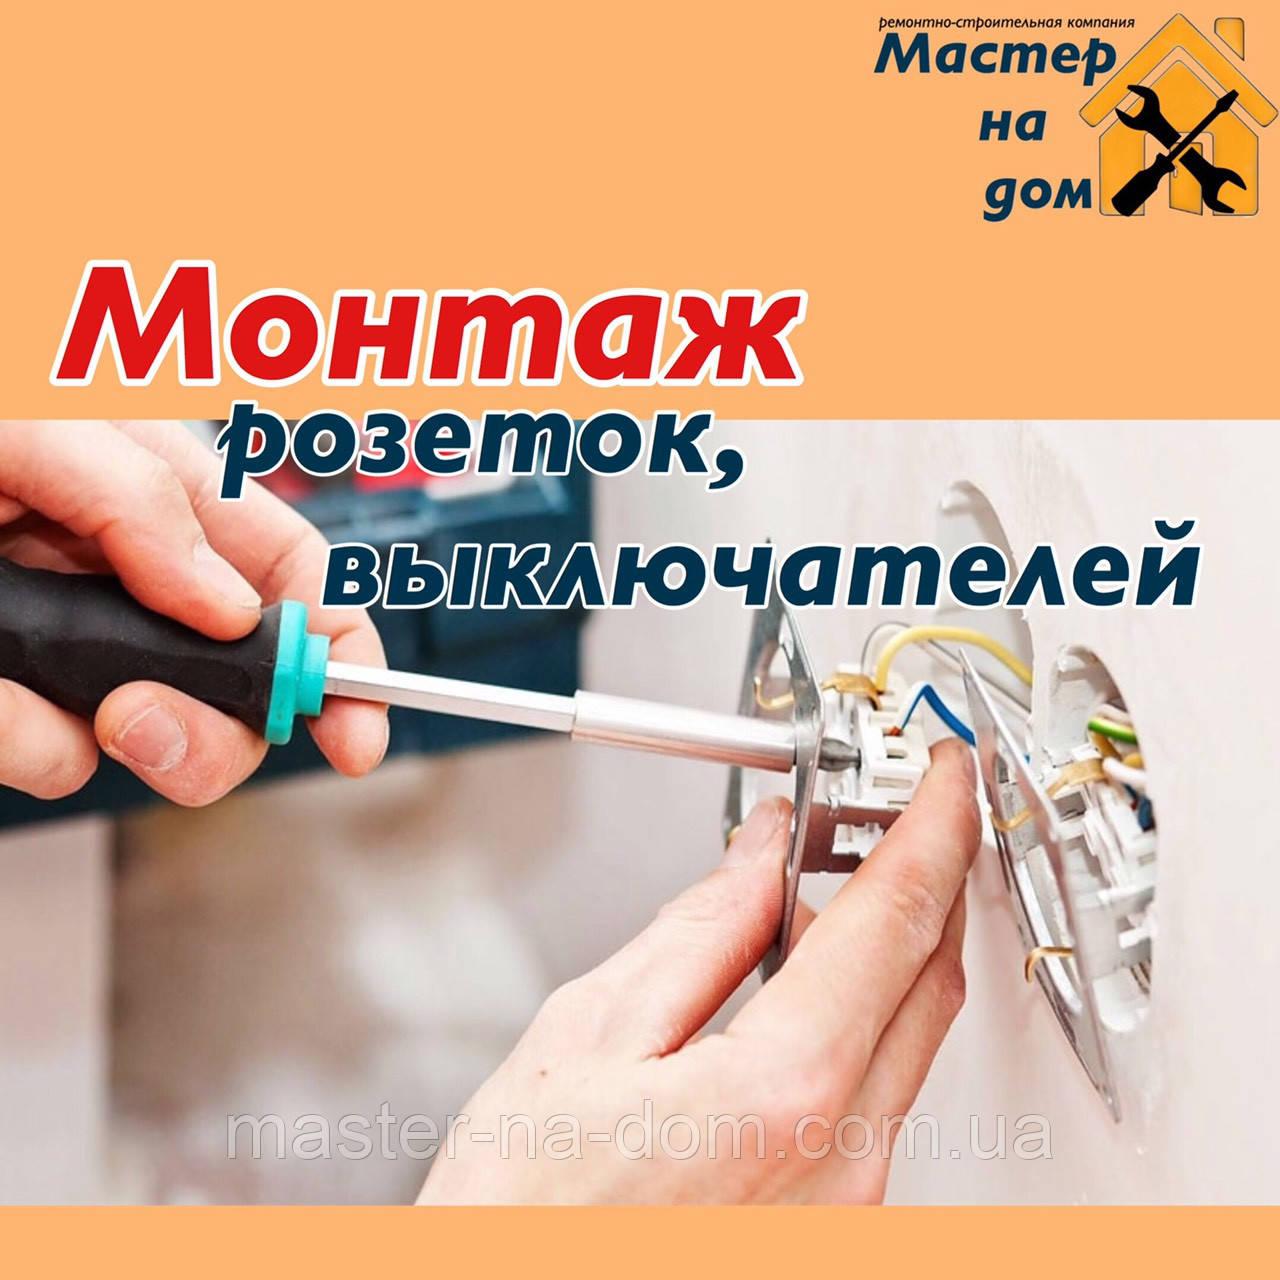 Монтаж розеток, выключателей во Львове